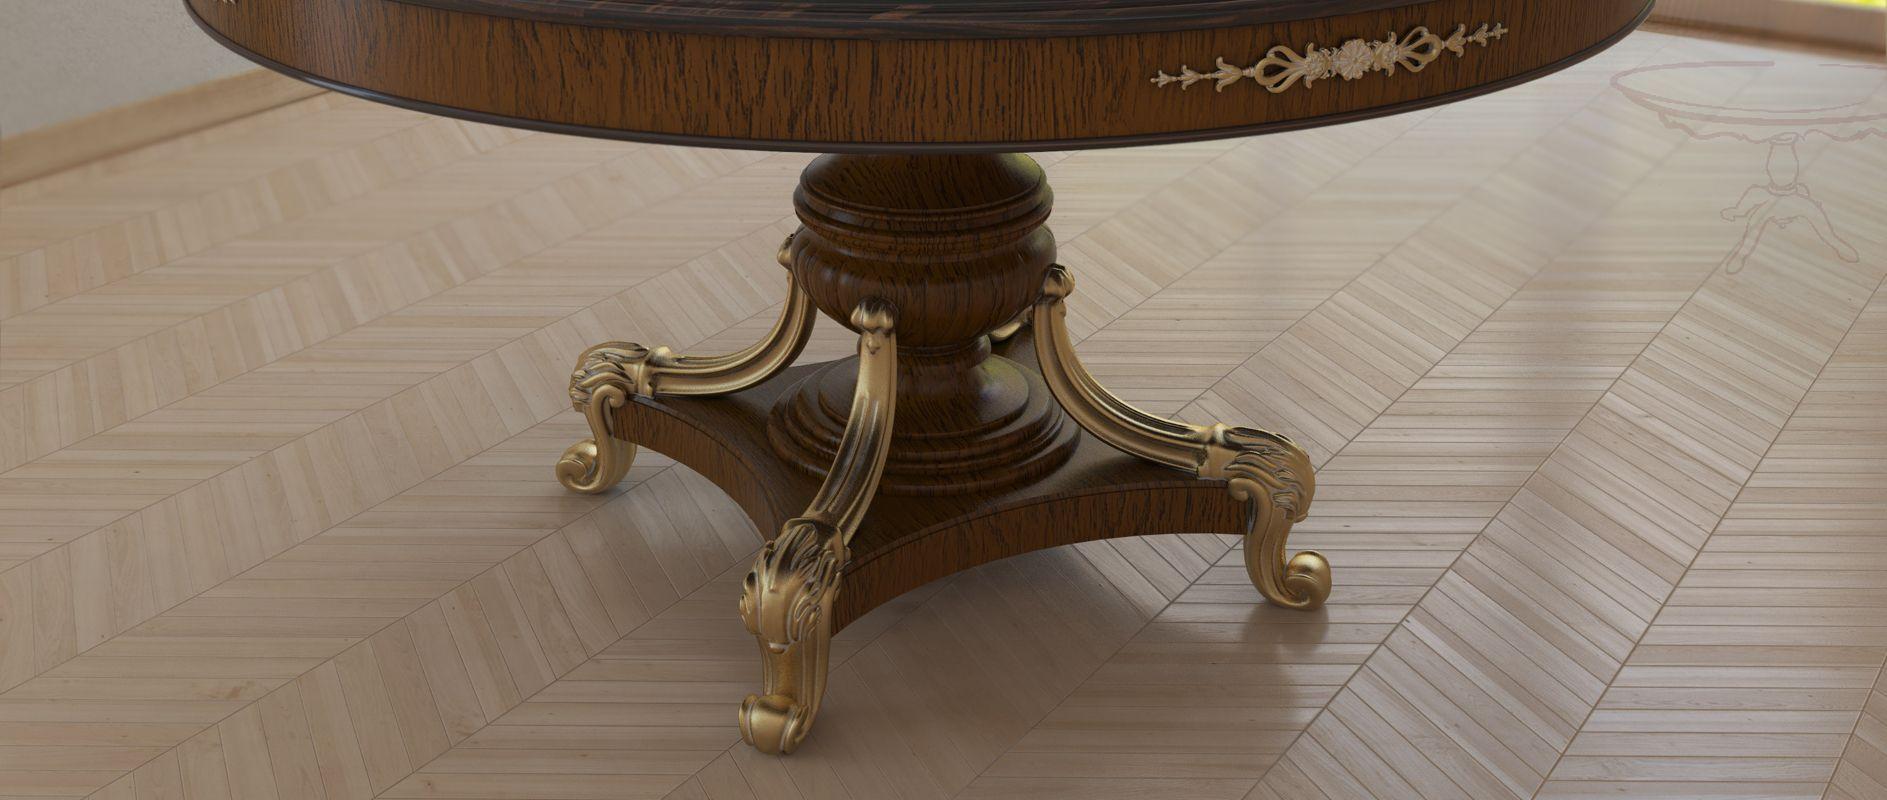 Obedenniy-stol212-Legrantes